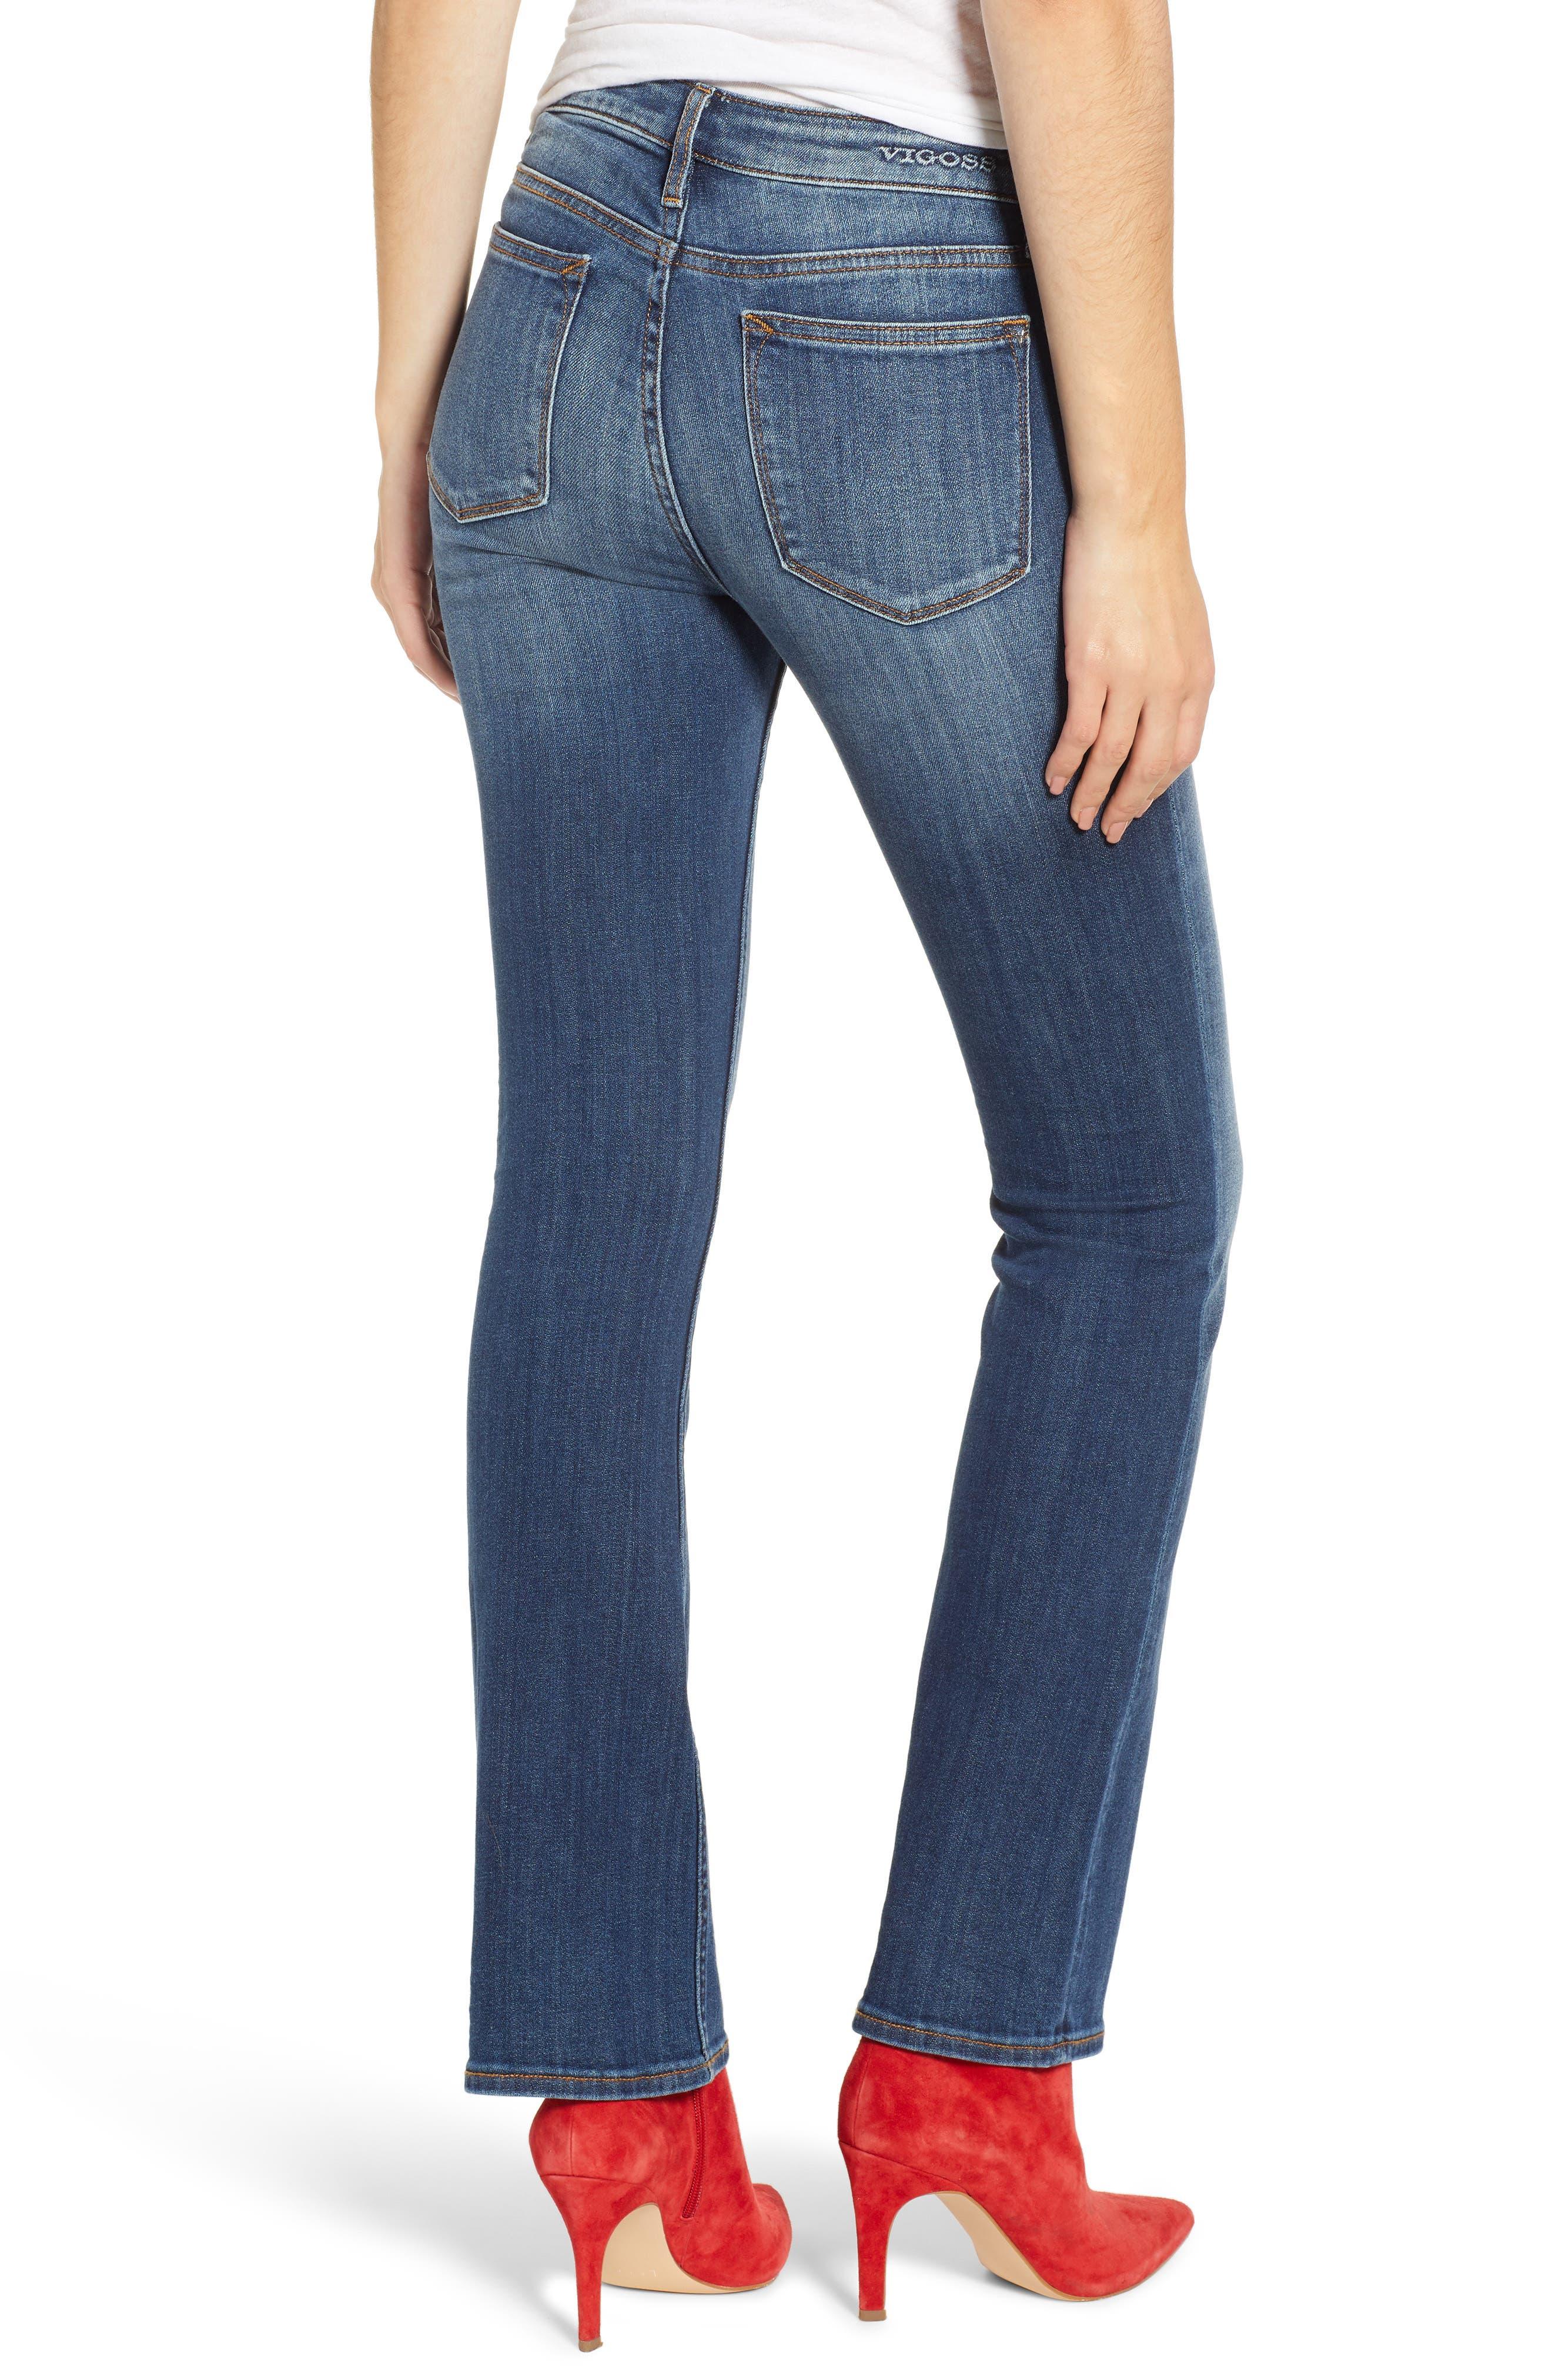 Jagger High Waist Bootcut Jeans,                             Alternate thumbnail 2, color,                             DARK WASH